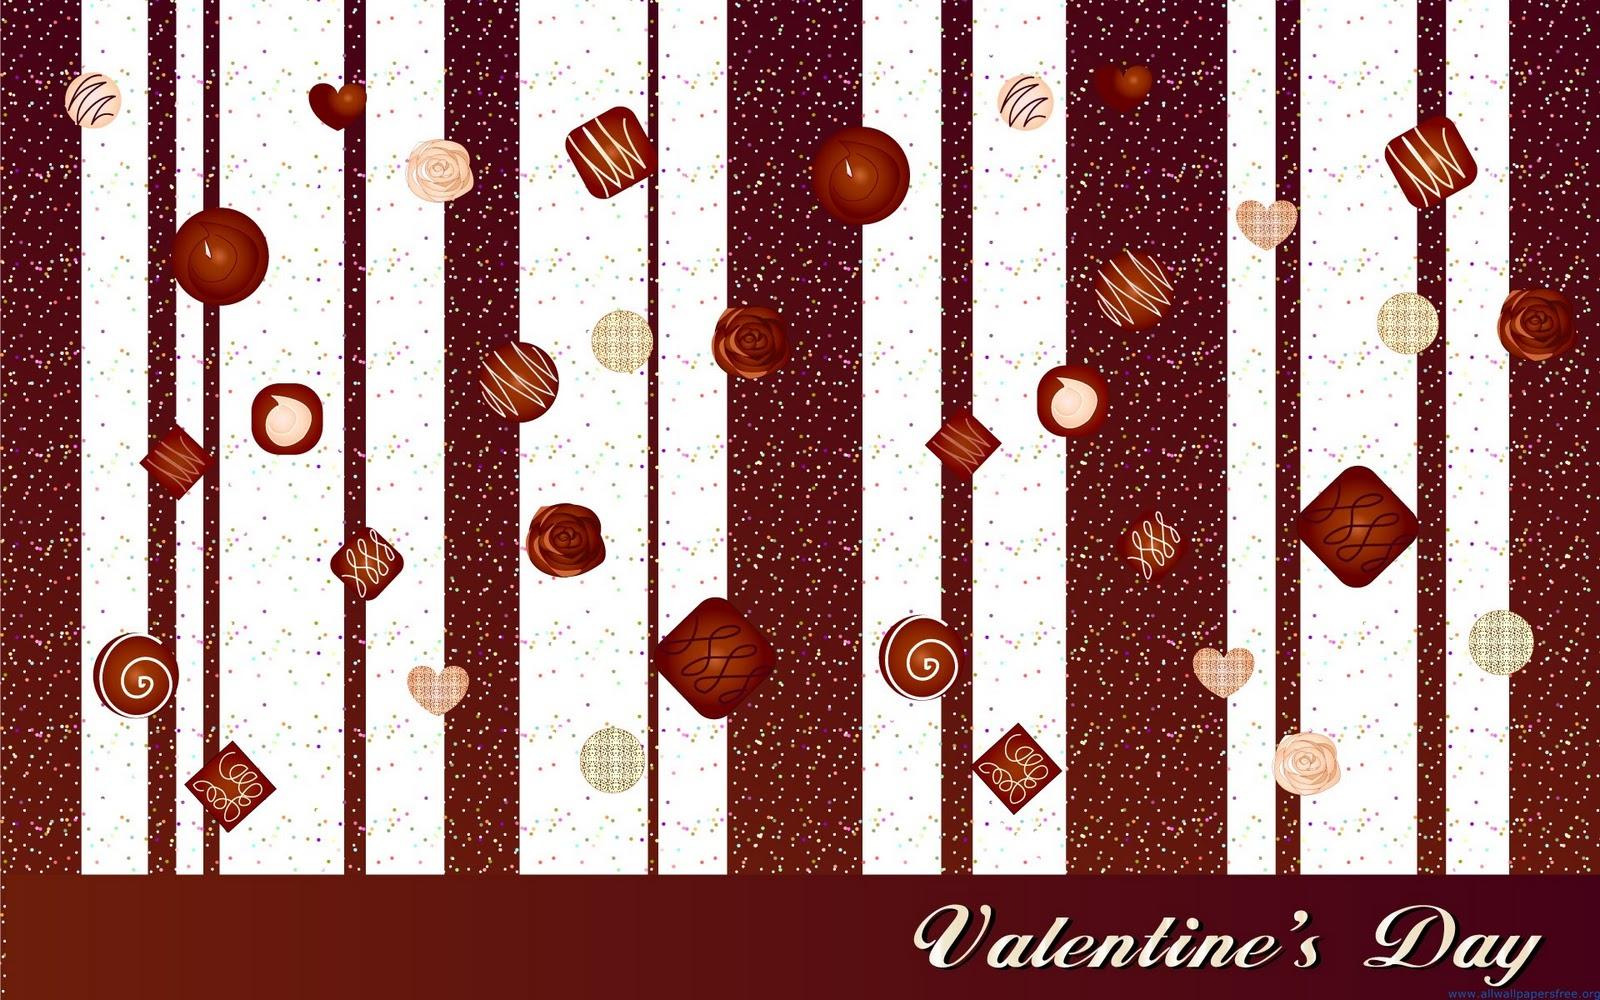 http://3.bp.blogspot.com/-If6C02lzNAI/Tyo-HHSgkeI/AAAAAAAAB00/MnCWqIQMrU0/s1600/Beautiful+Valentine%2527s+Day+HD+Widescreen+Wallpapers+%252857%2529.jpg